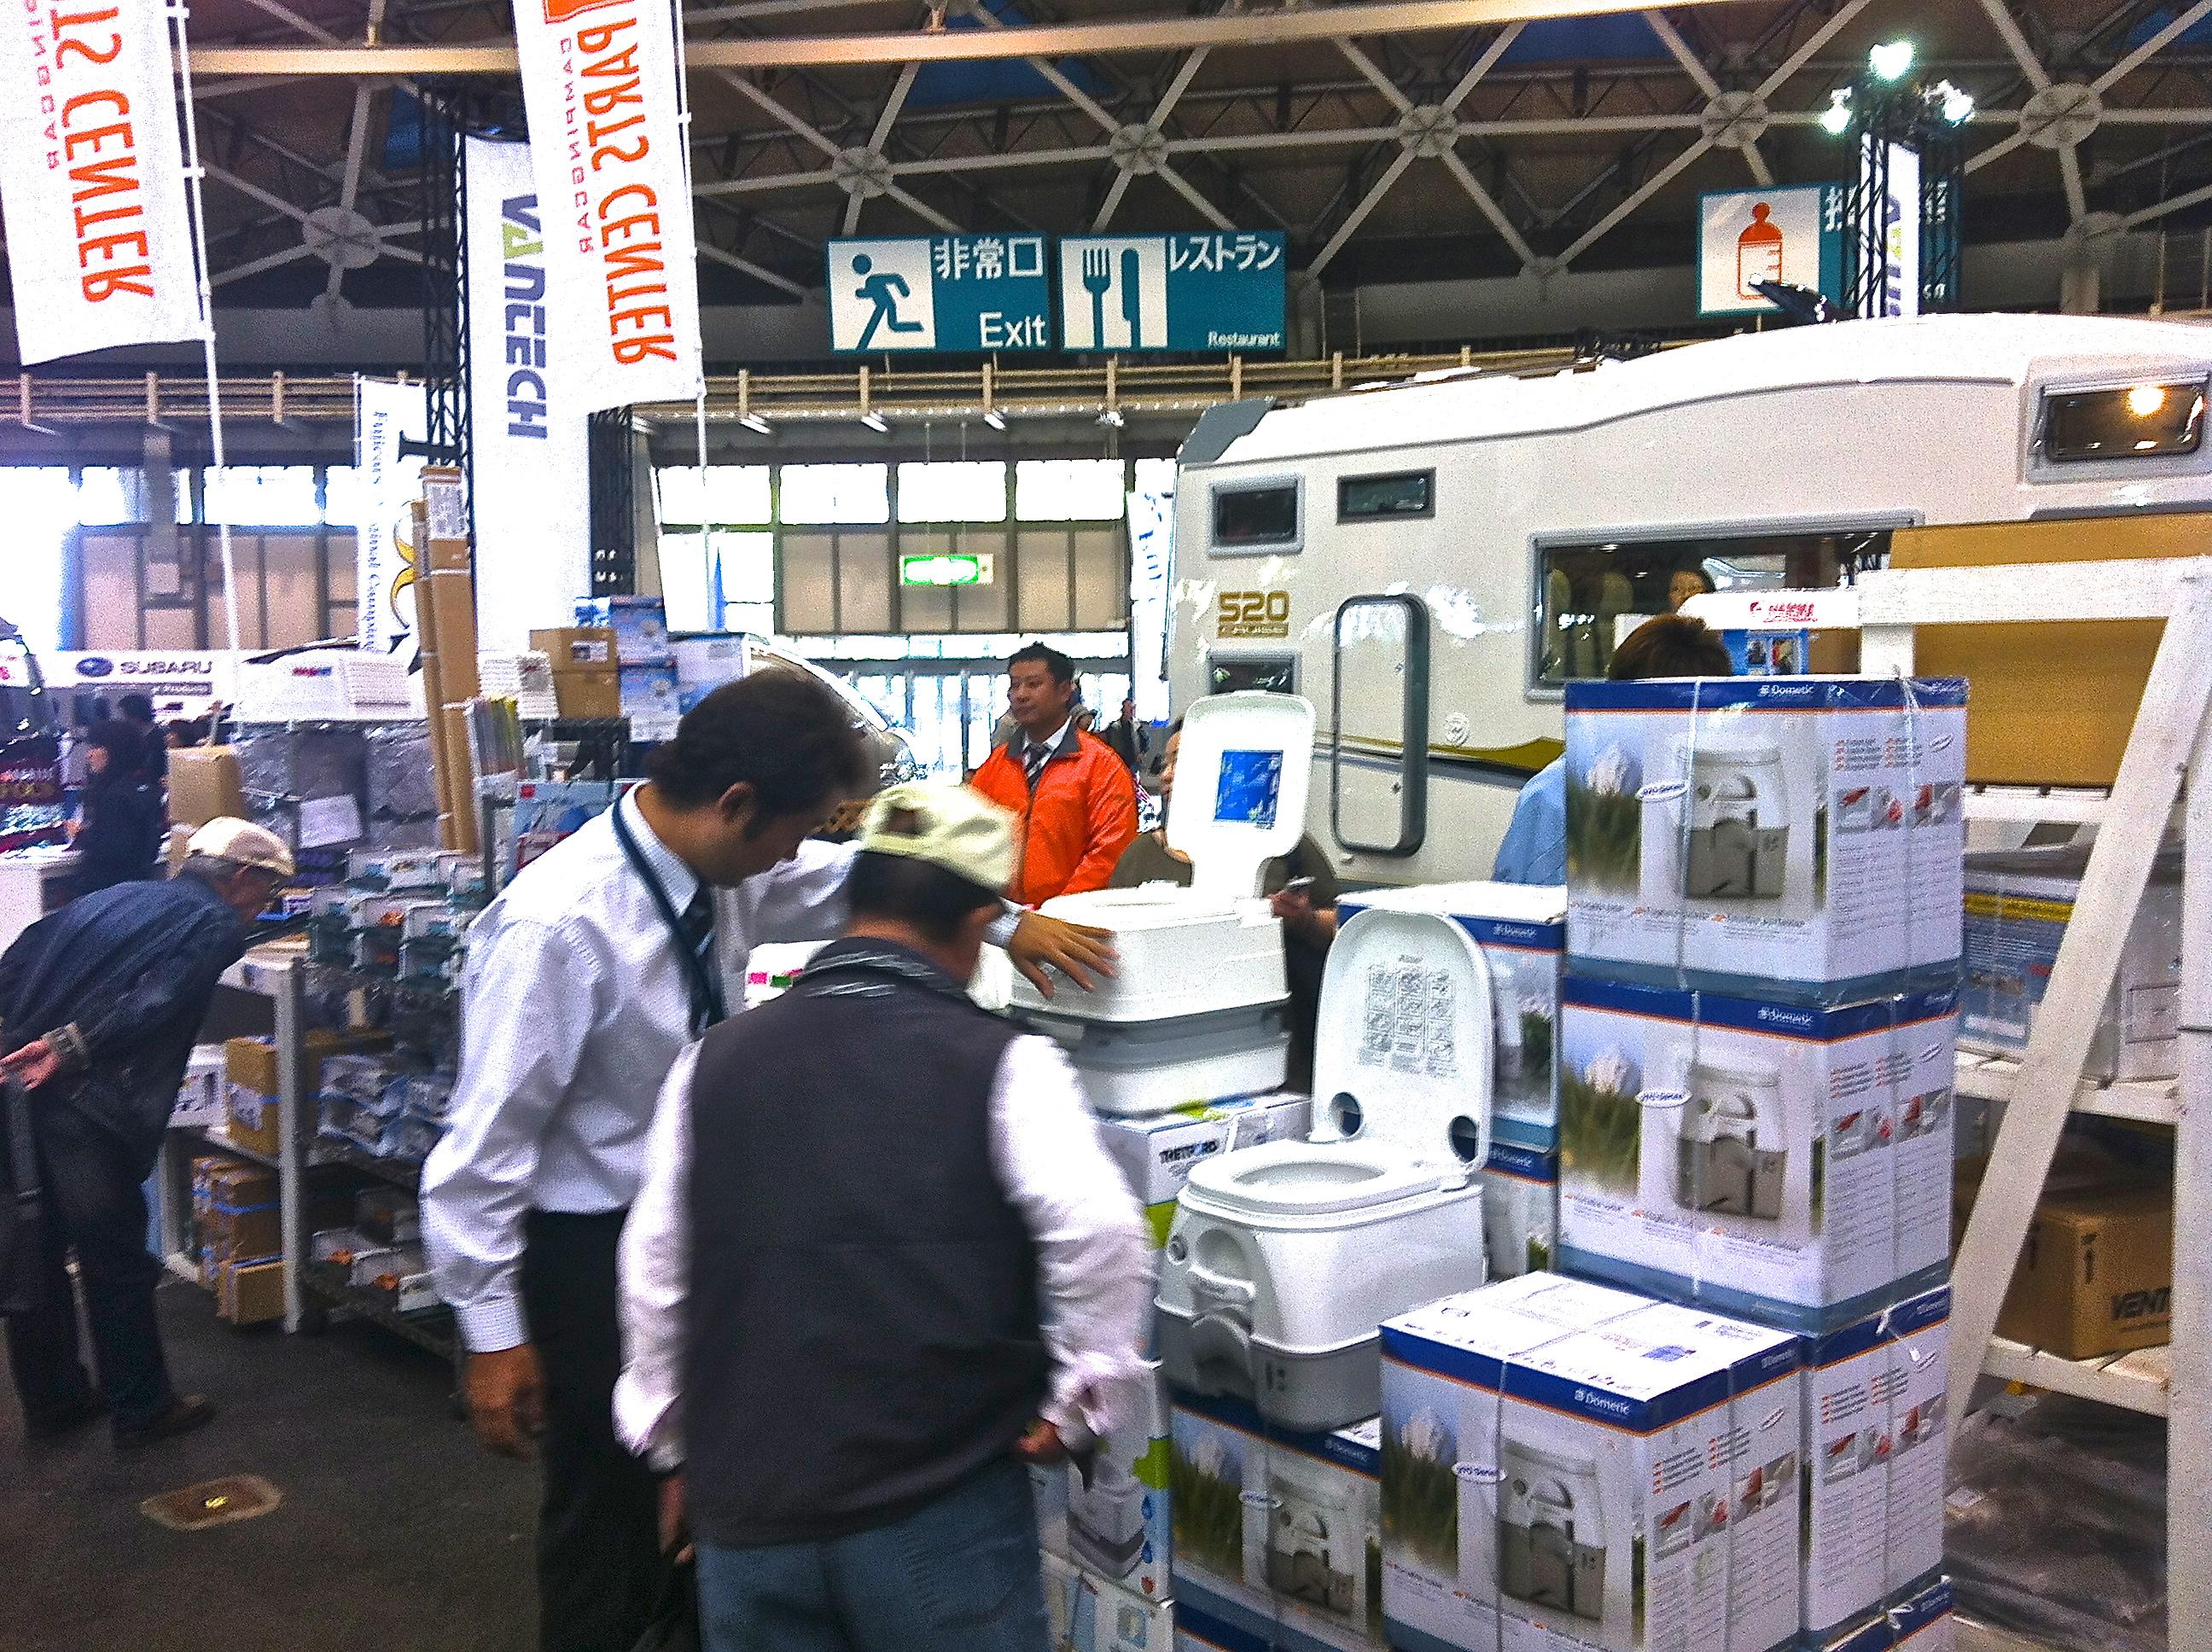 http://www.vantech.jp/shops/info/IMG_0463.JPG